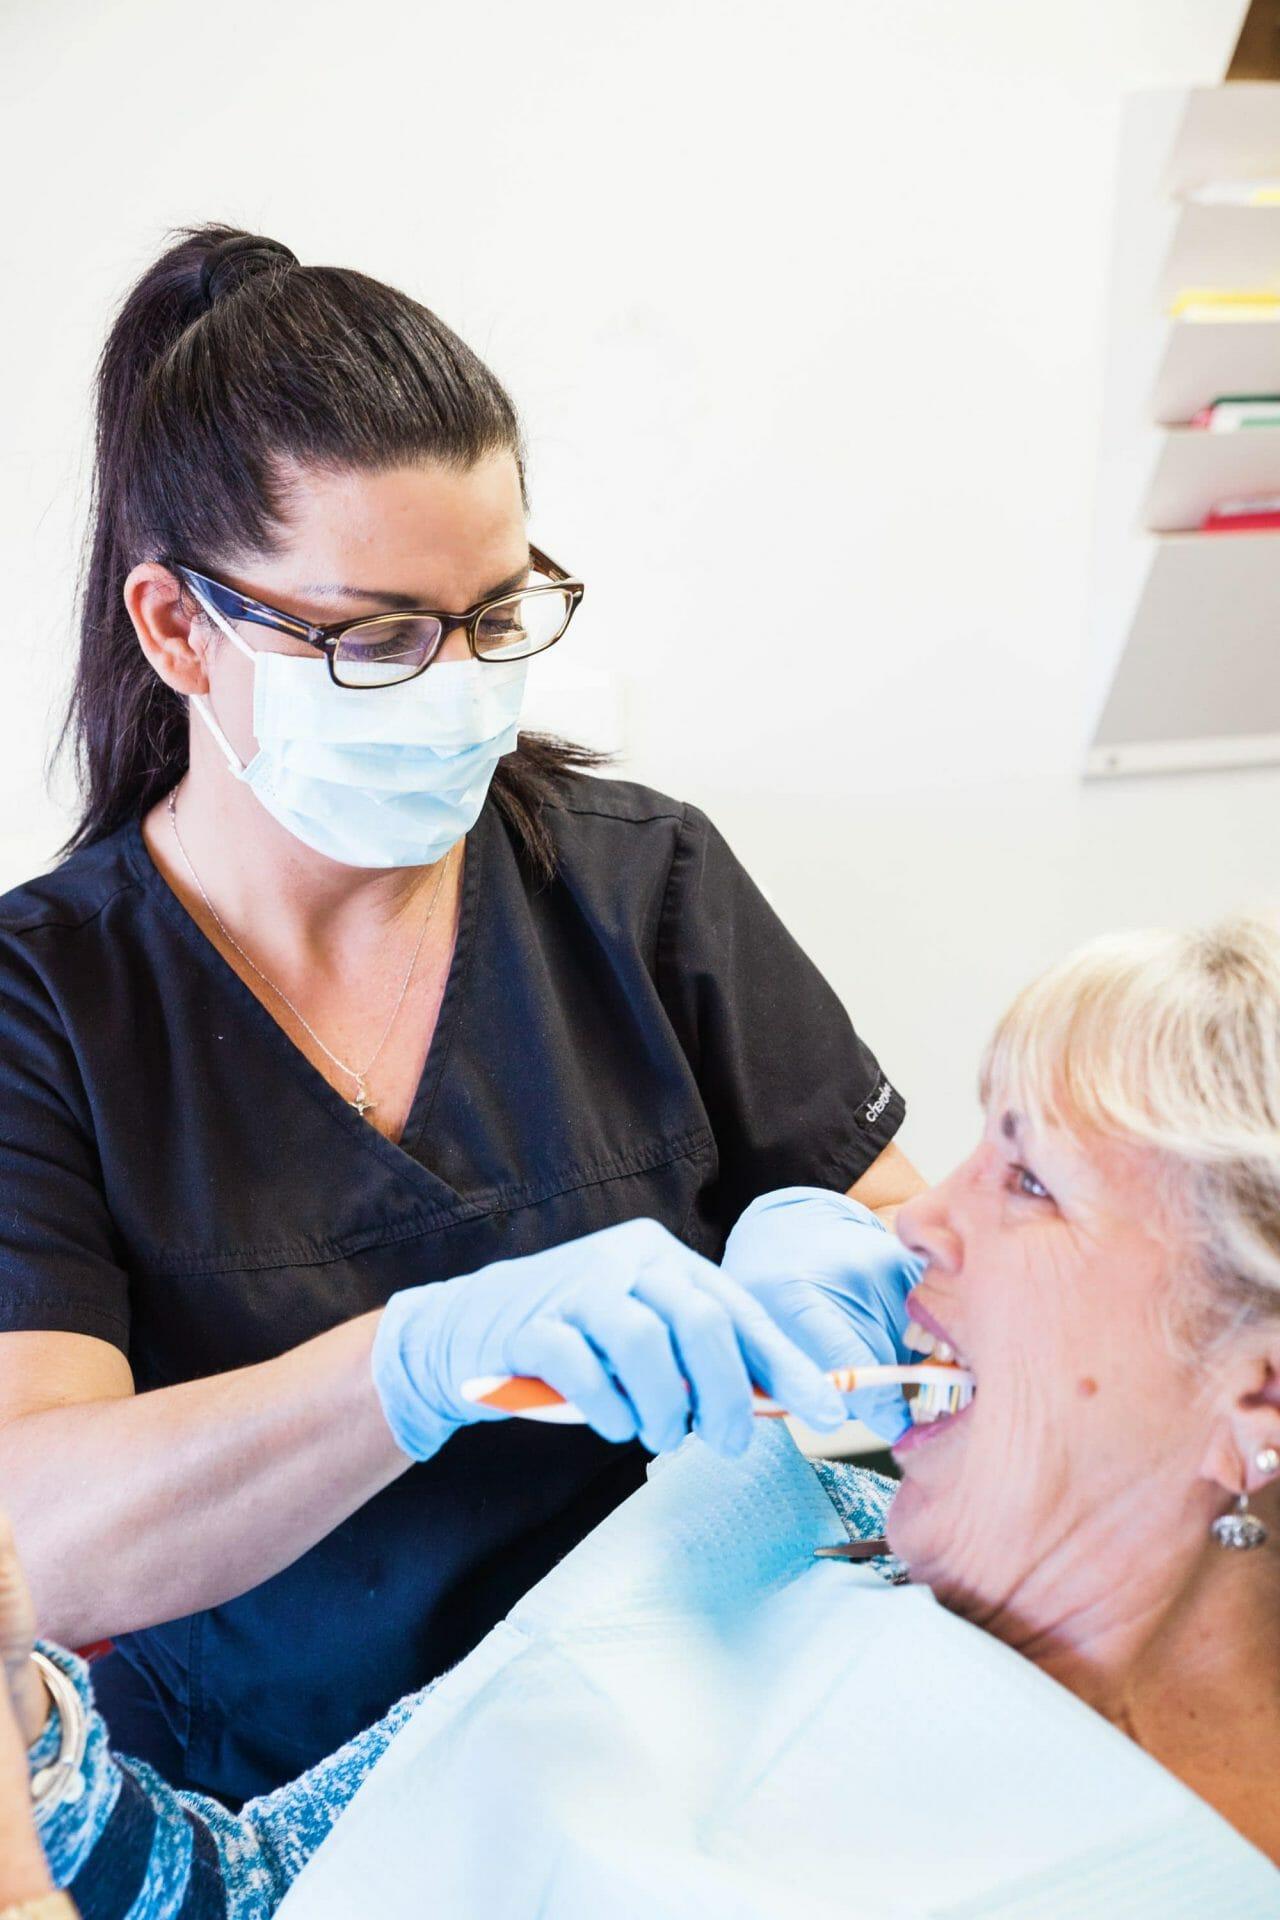 hygienist brushing patient's teeth